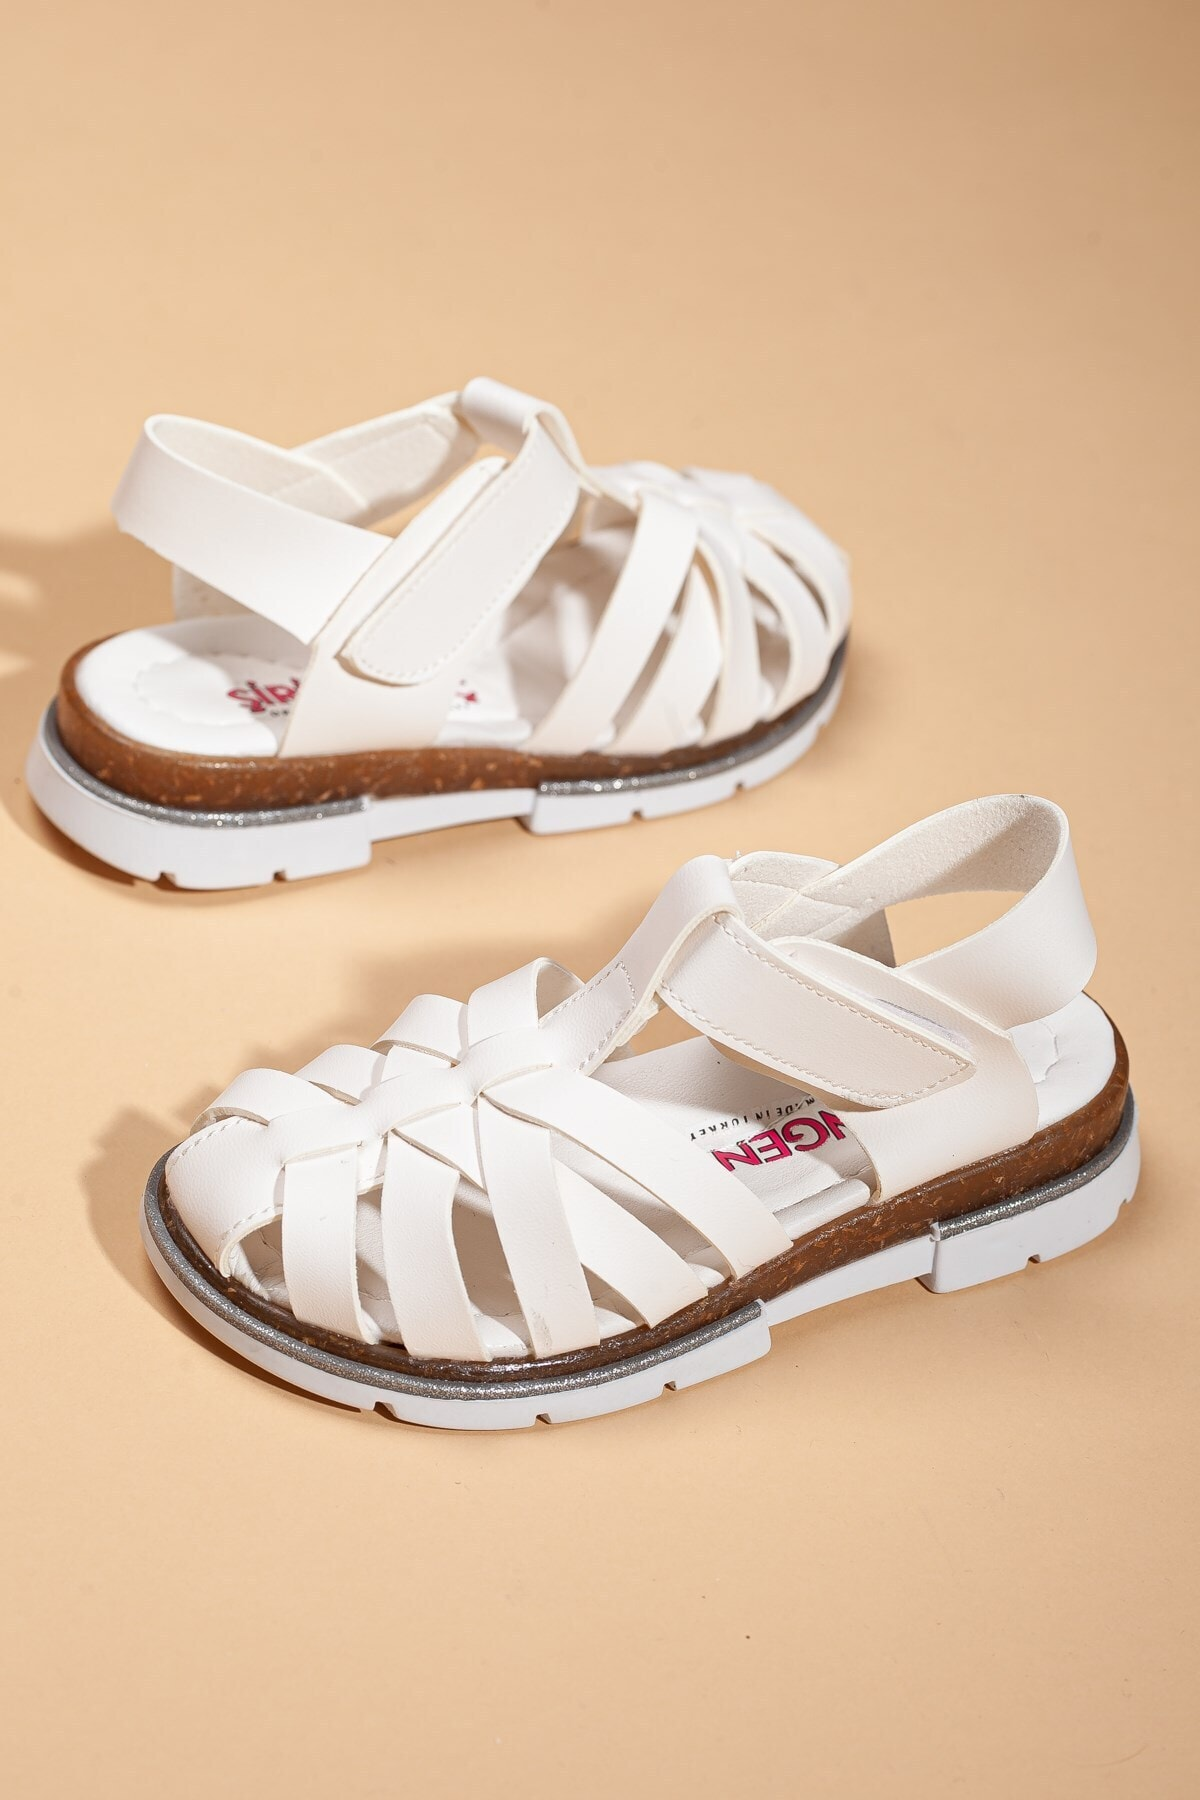 Şirin Genç Ortopedic Kafes Kız Beyaz Patik Flet Sandalet (26-36 NUMARA).